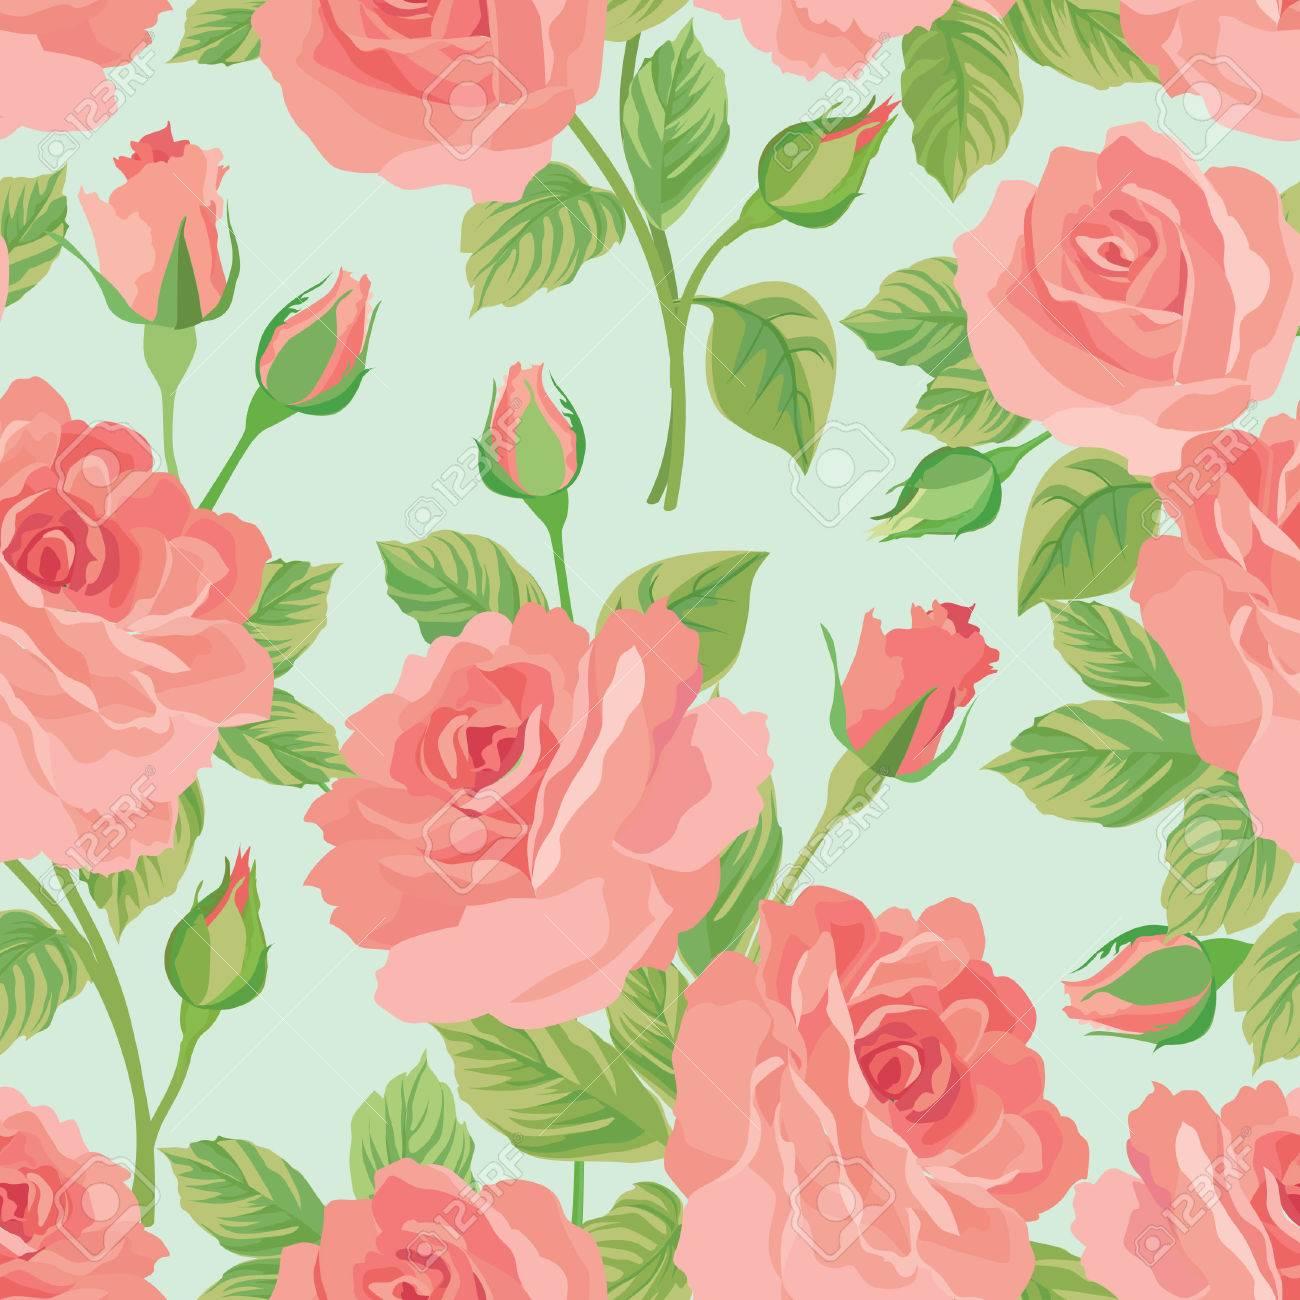 Ramo De Flores Sin Fisuras Patron Fondo Ramillete De Flores